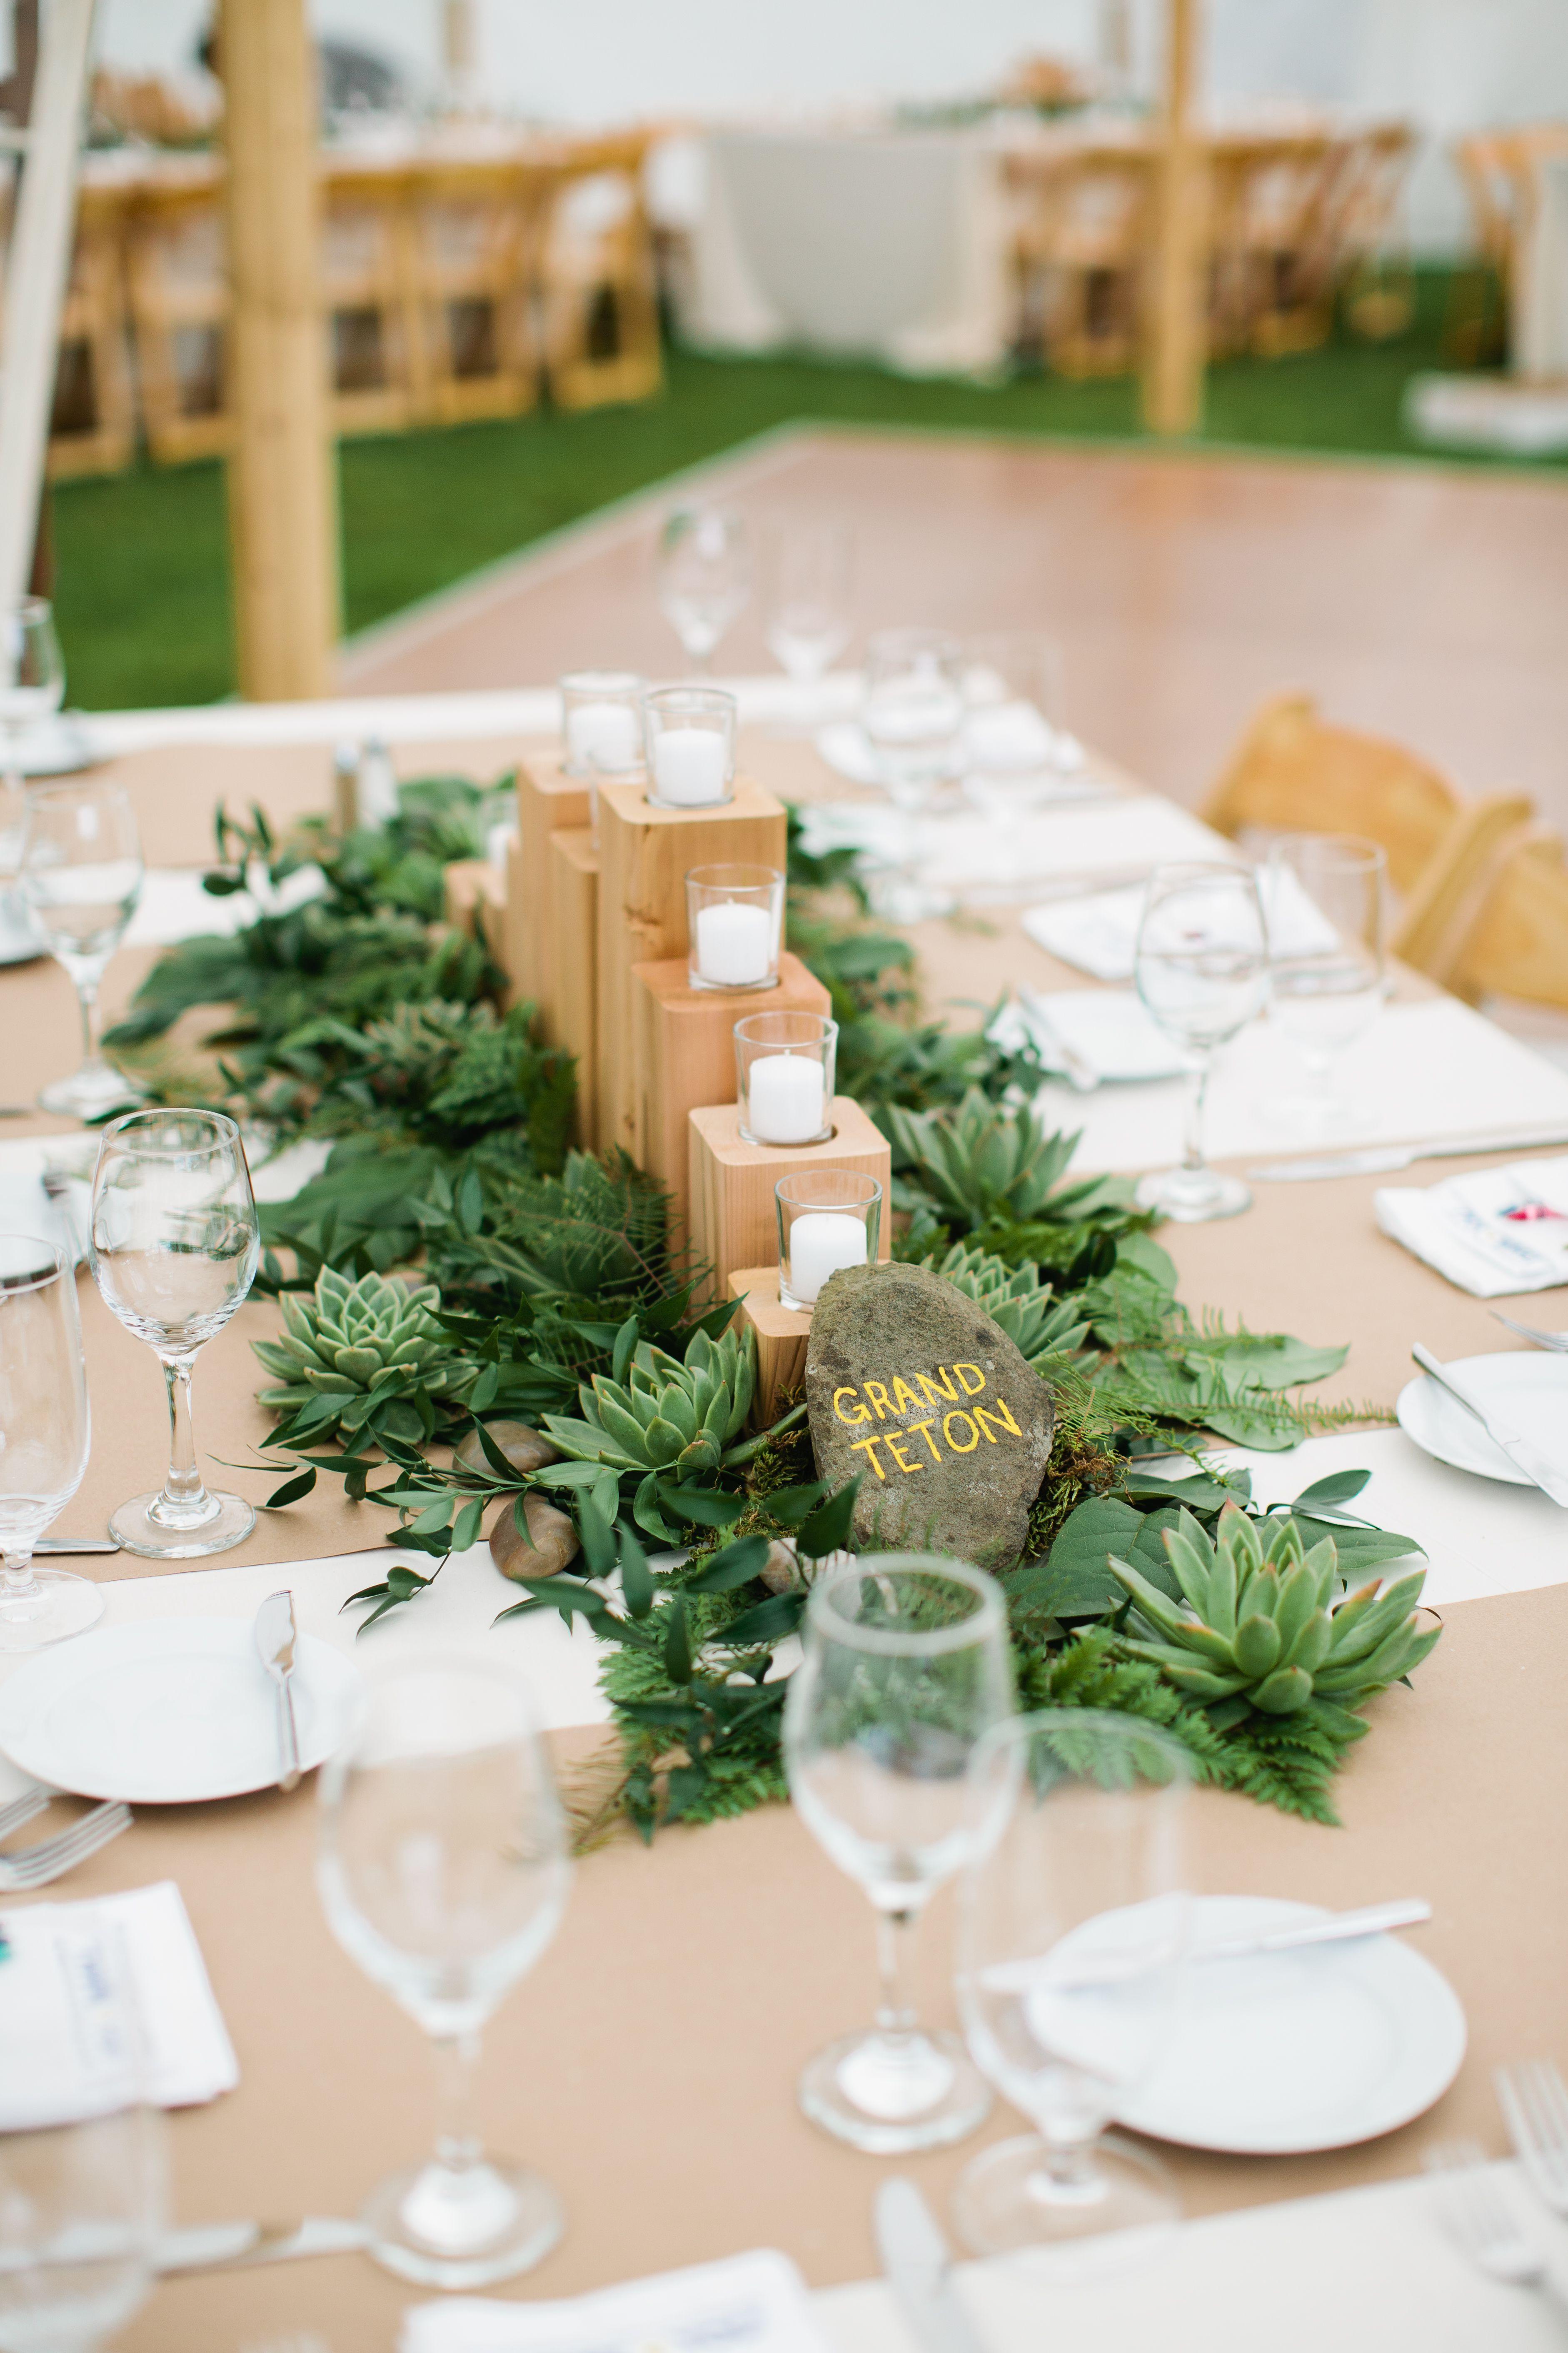 Boho Small Dining Table